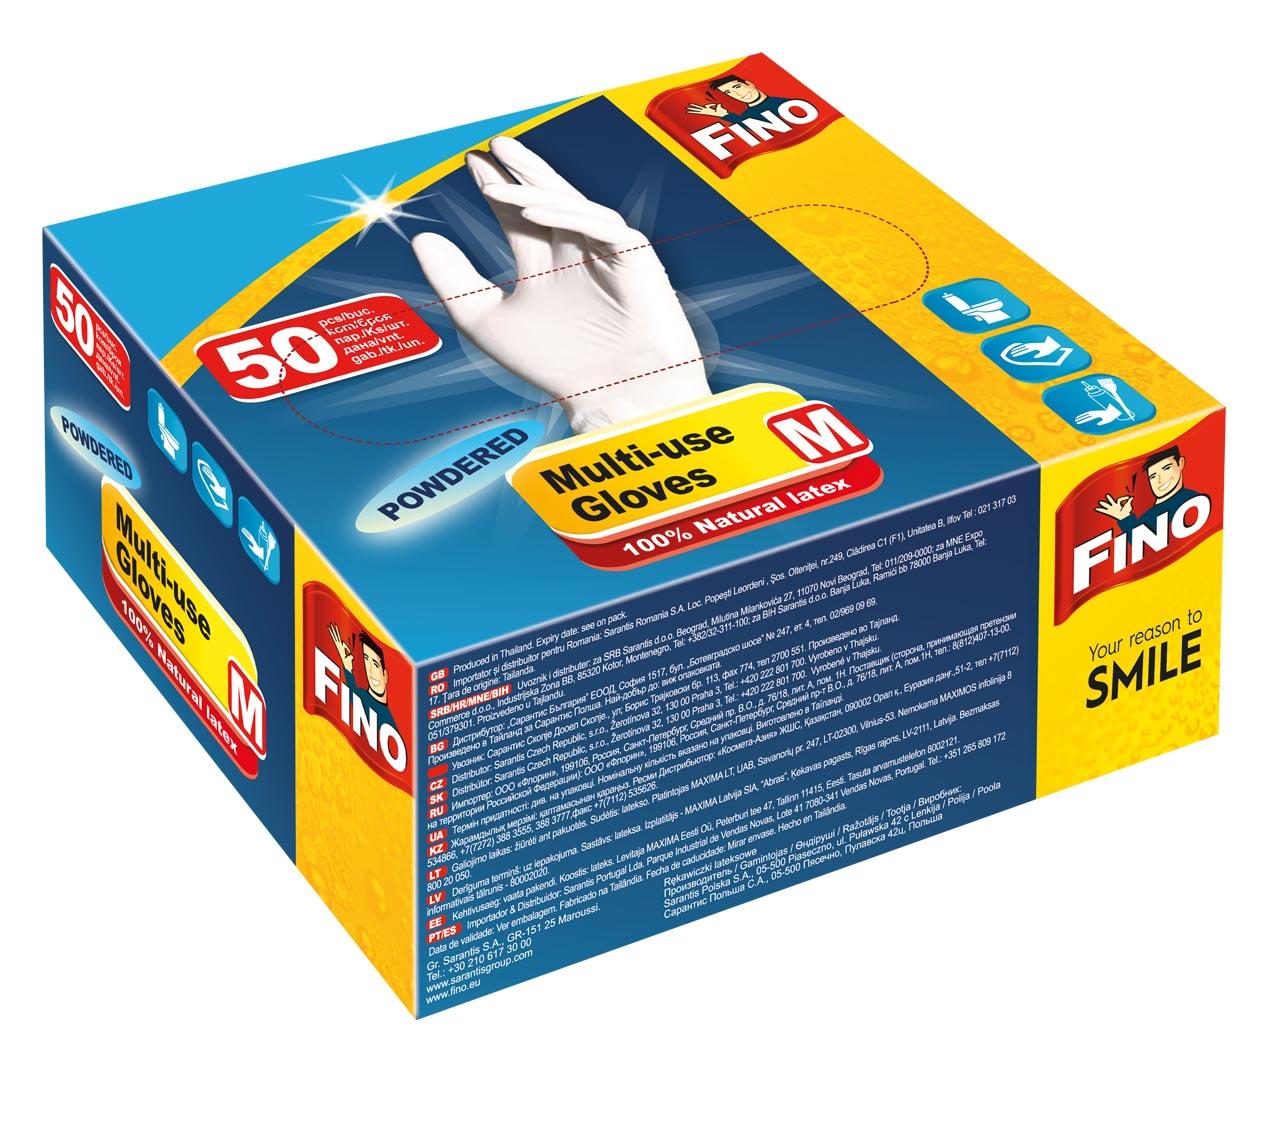 Fino jednorázové rukavice pudrované M 50 ks a044b8c920